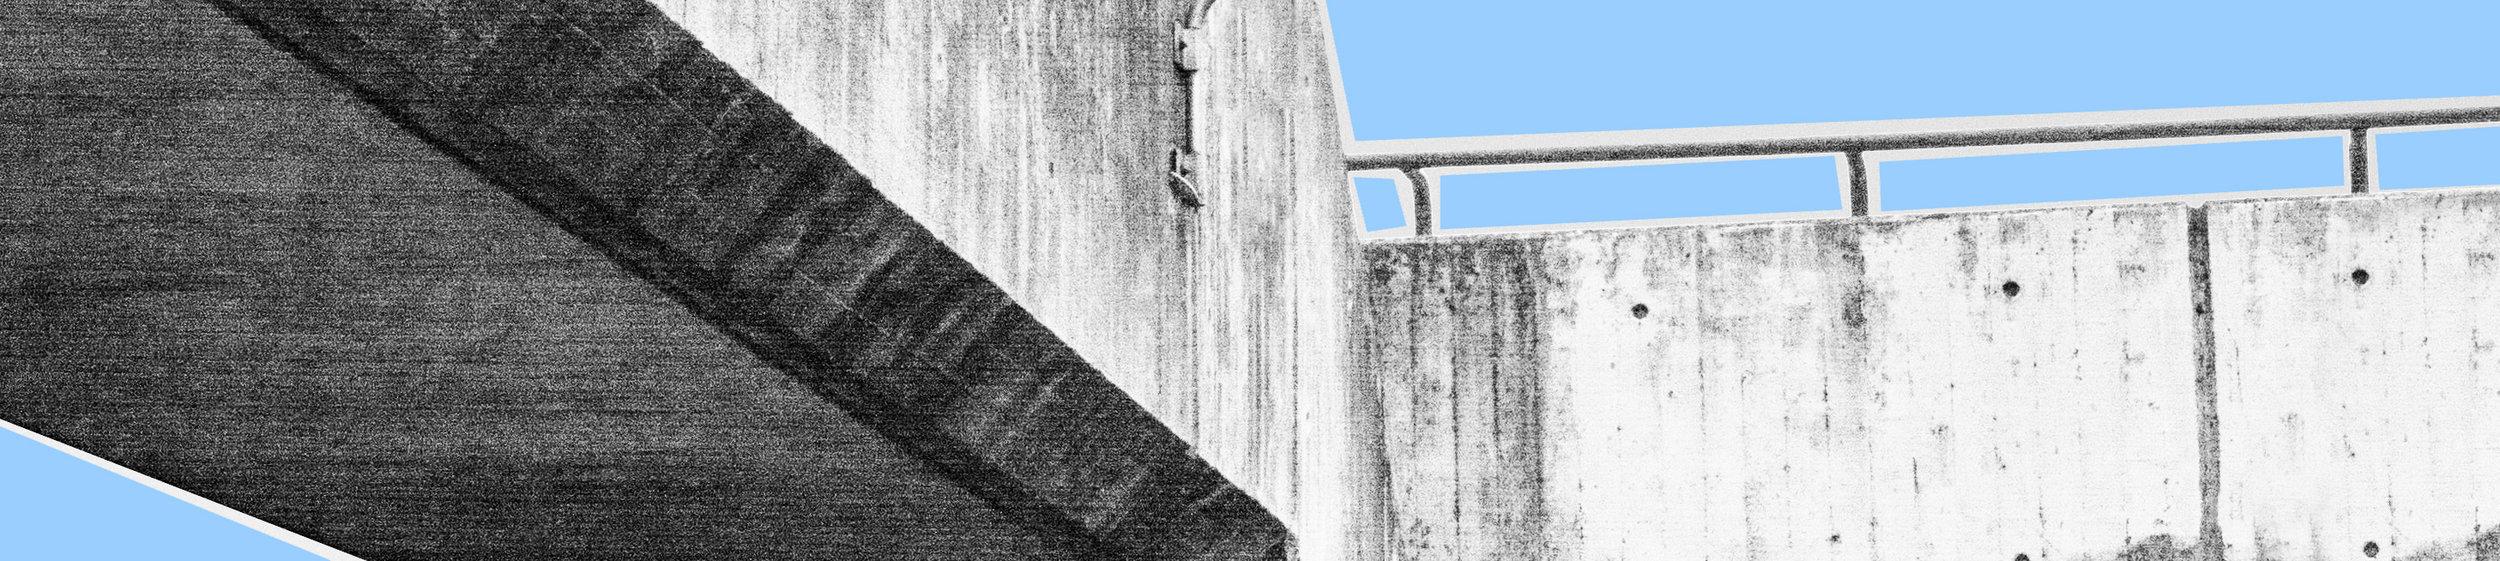 studio fresia architettura perizie e valutazioni mondovì  geometri edilizia servizi architettura piemonte.jpg